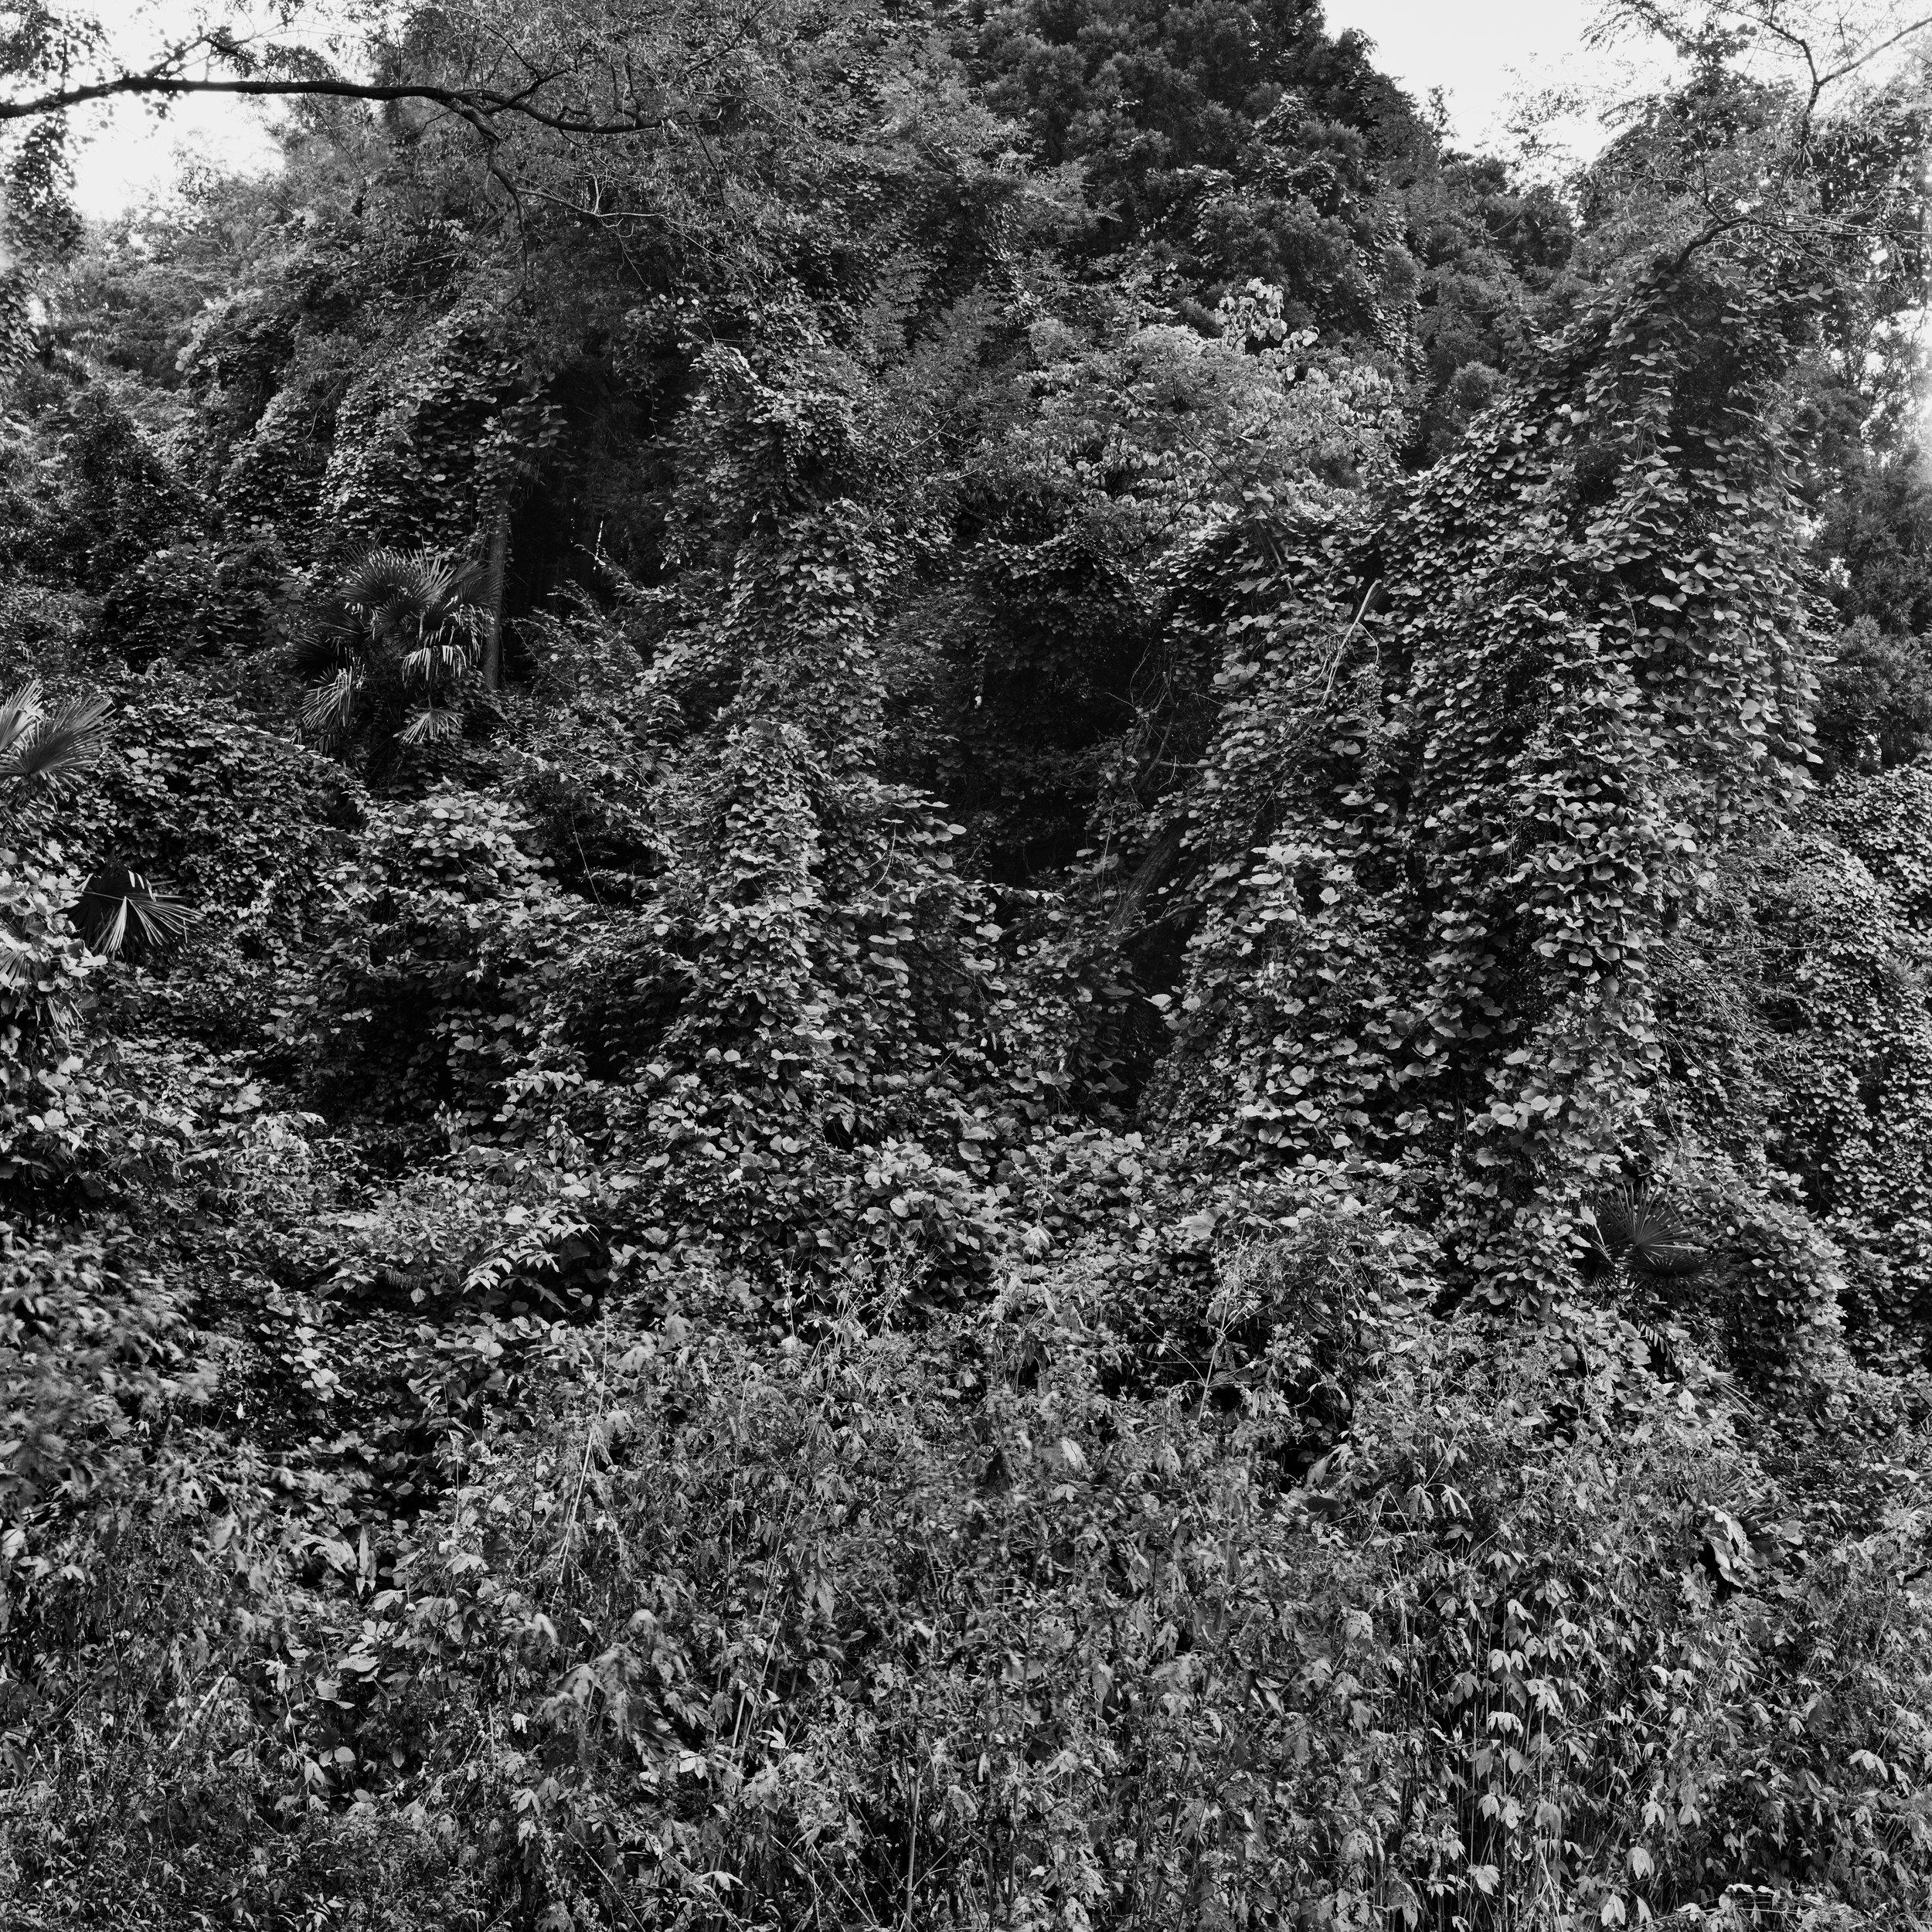 woodland45_005.jpg